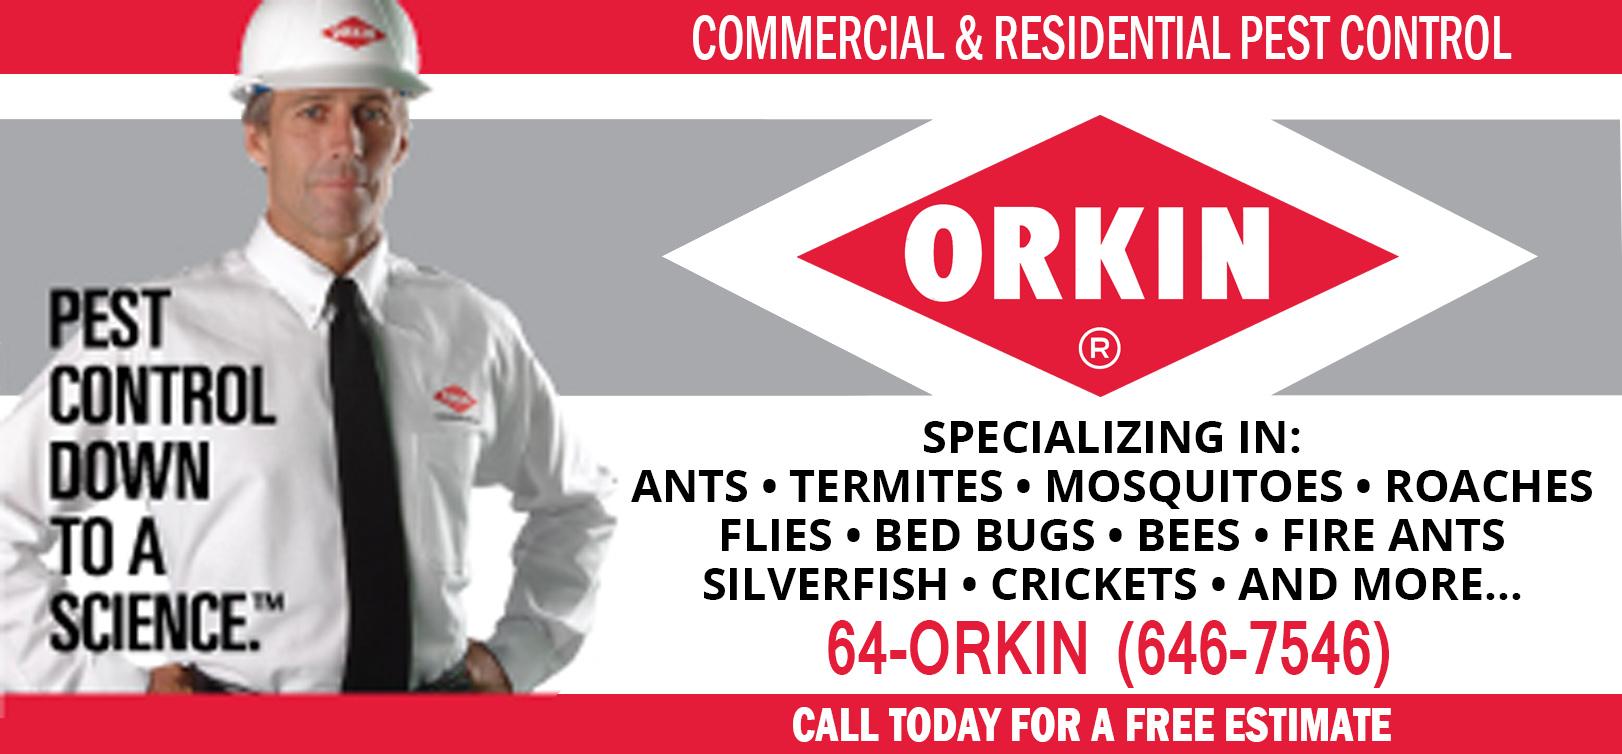 Online Directory - ORKIN PEST CONTROL - Online Directory